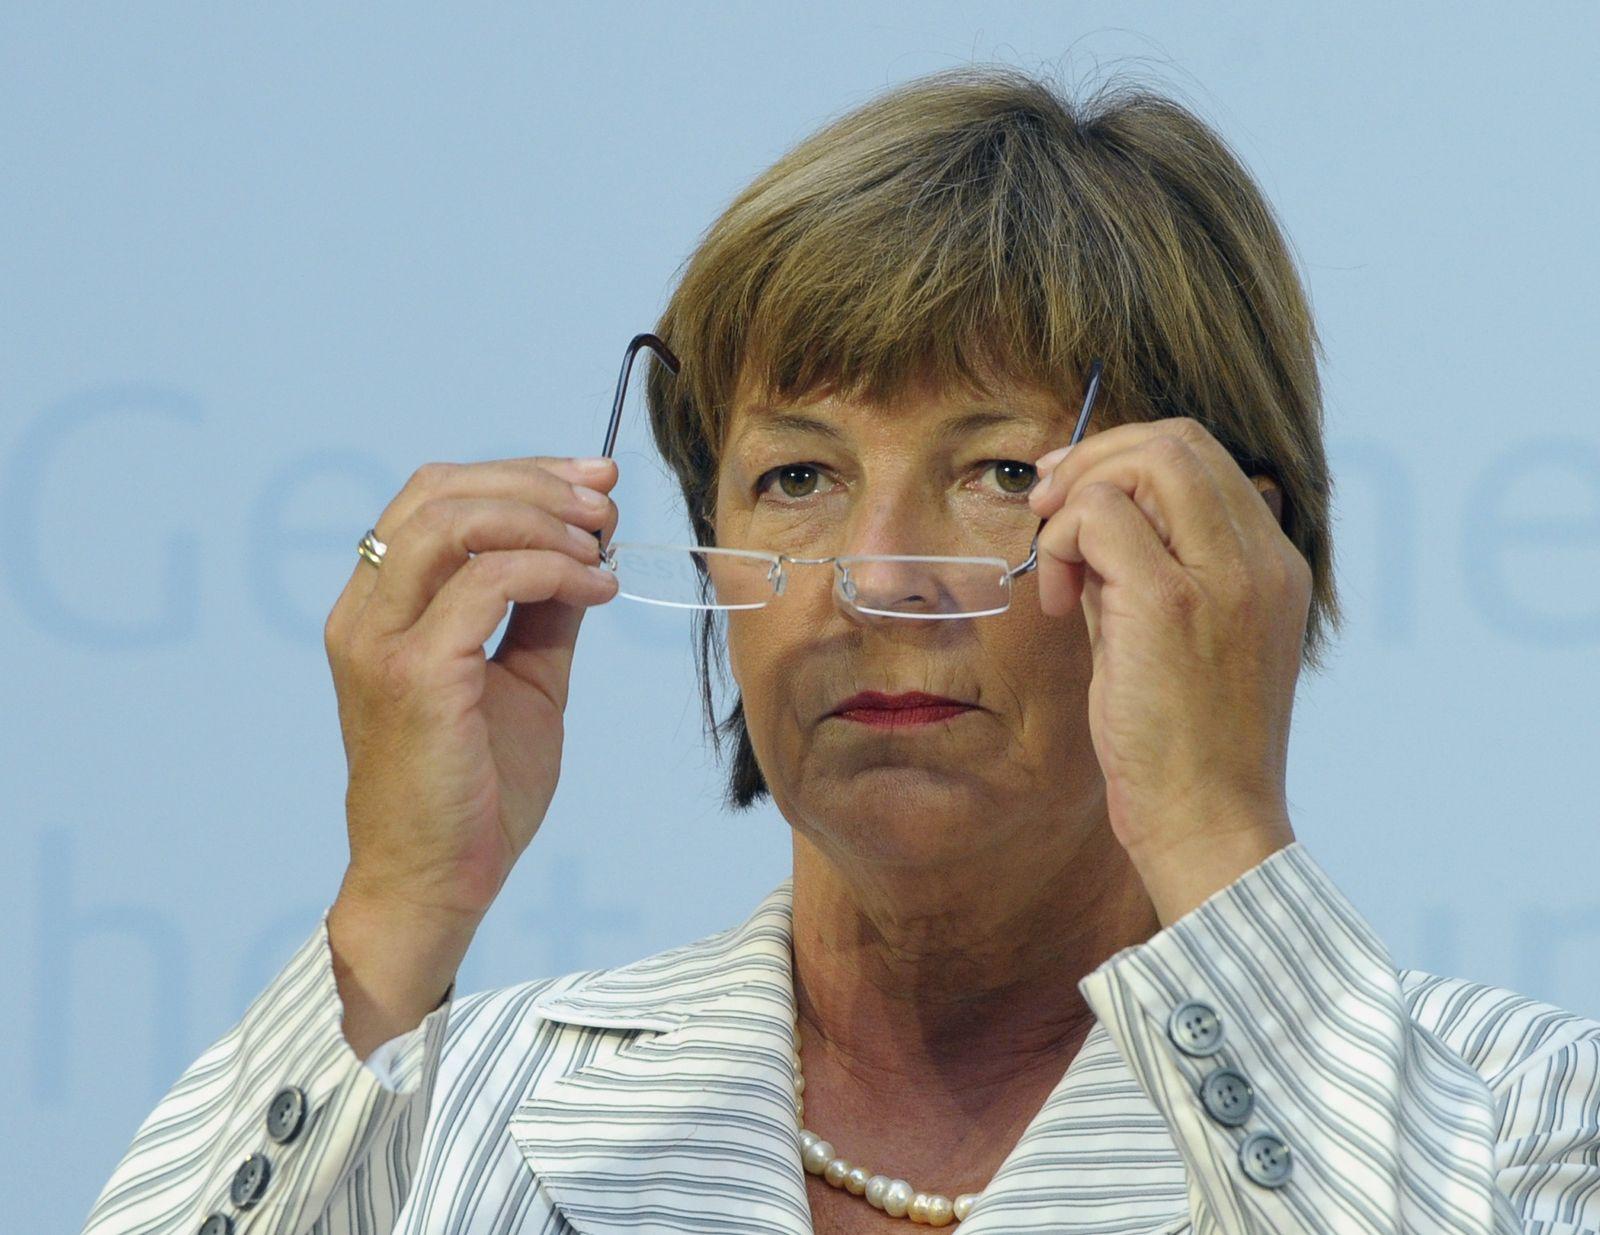 Neue Kritik an Schmidt wegen Dienstwagen-Affäre